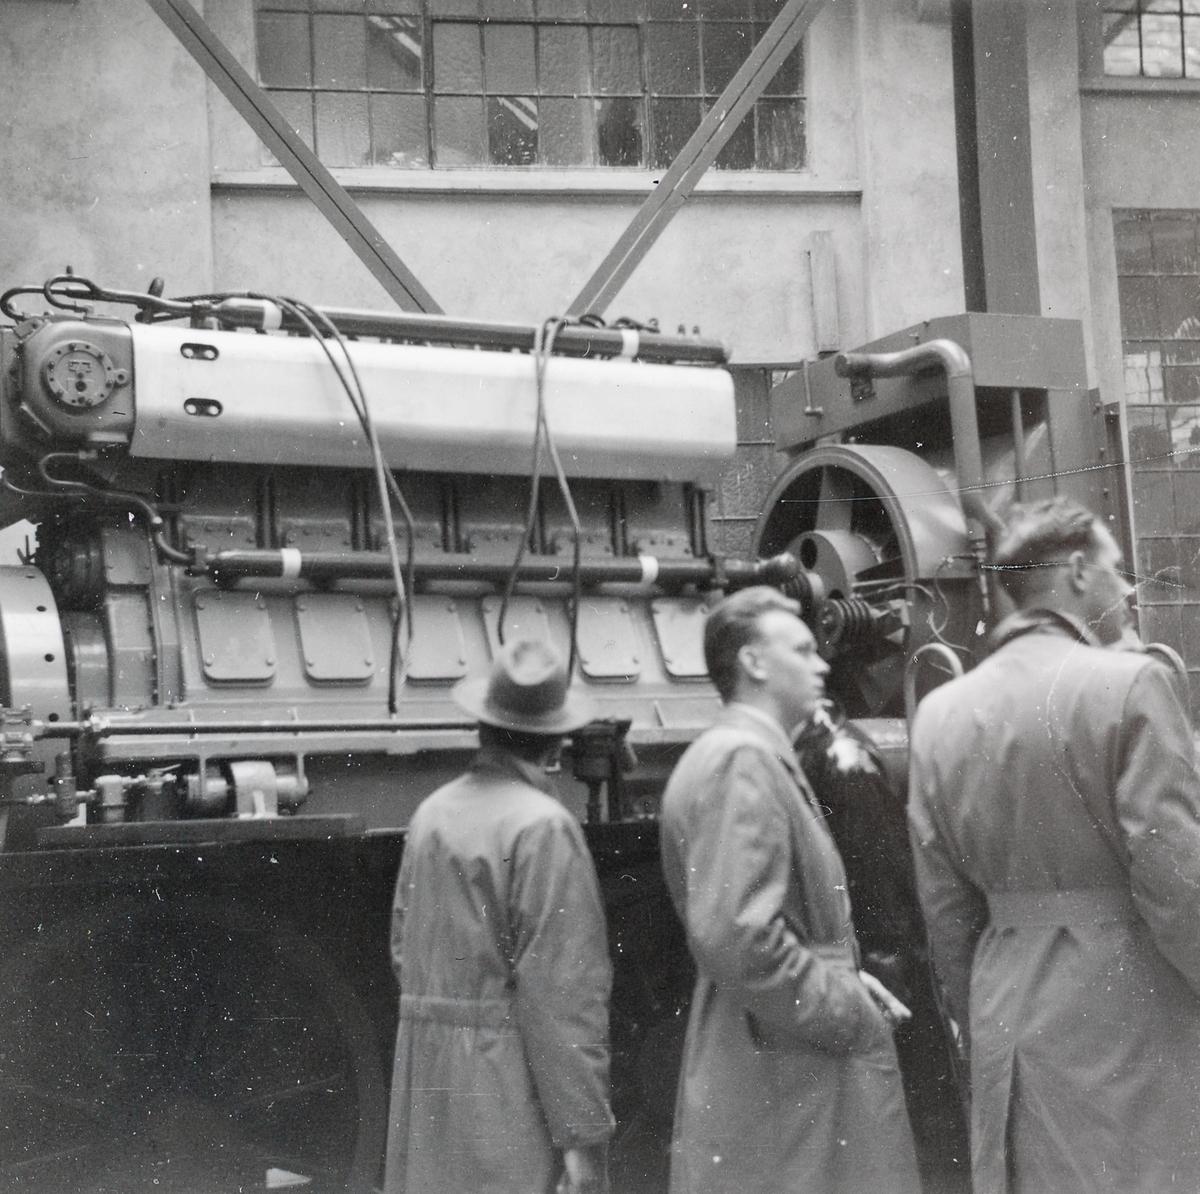 Maskineriet på diesellokomotiv for skiftetjeneste type Di 2 nr. 804 eller 805 under bygging på Thunes Mekaniske Verksted i Oslo.